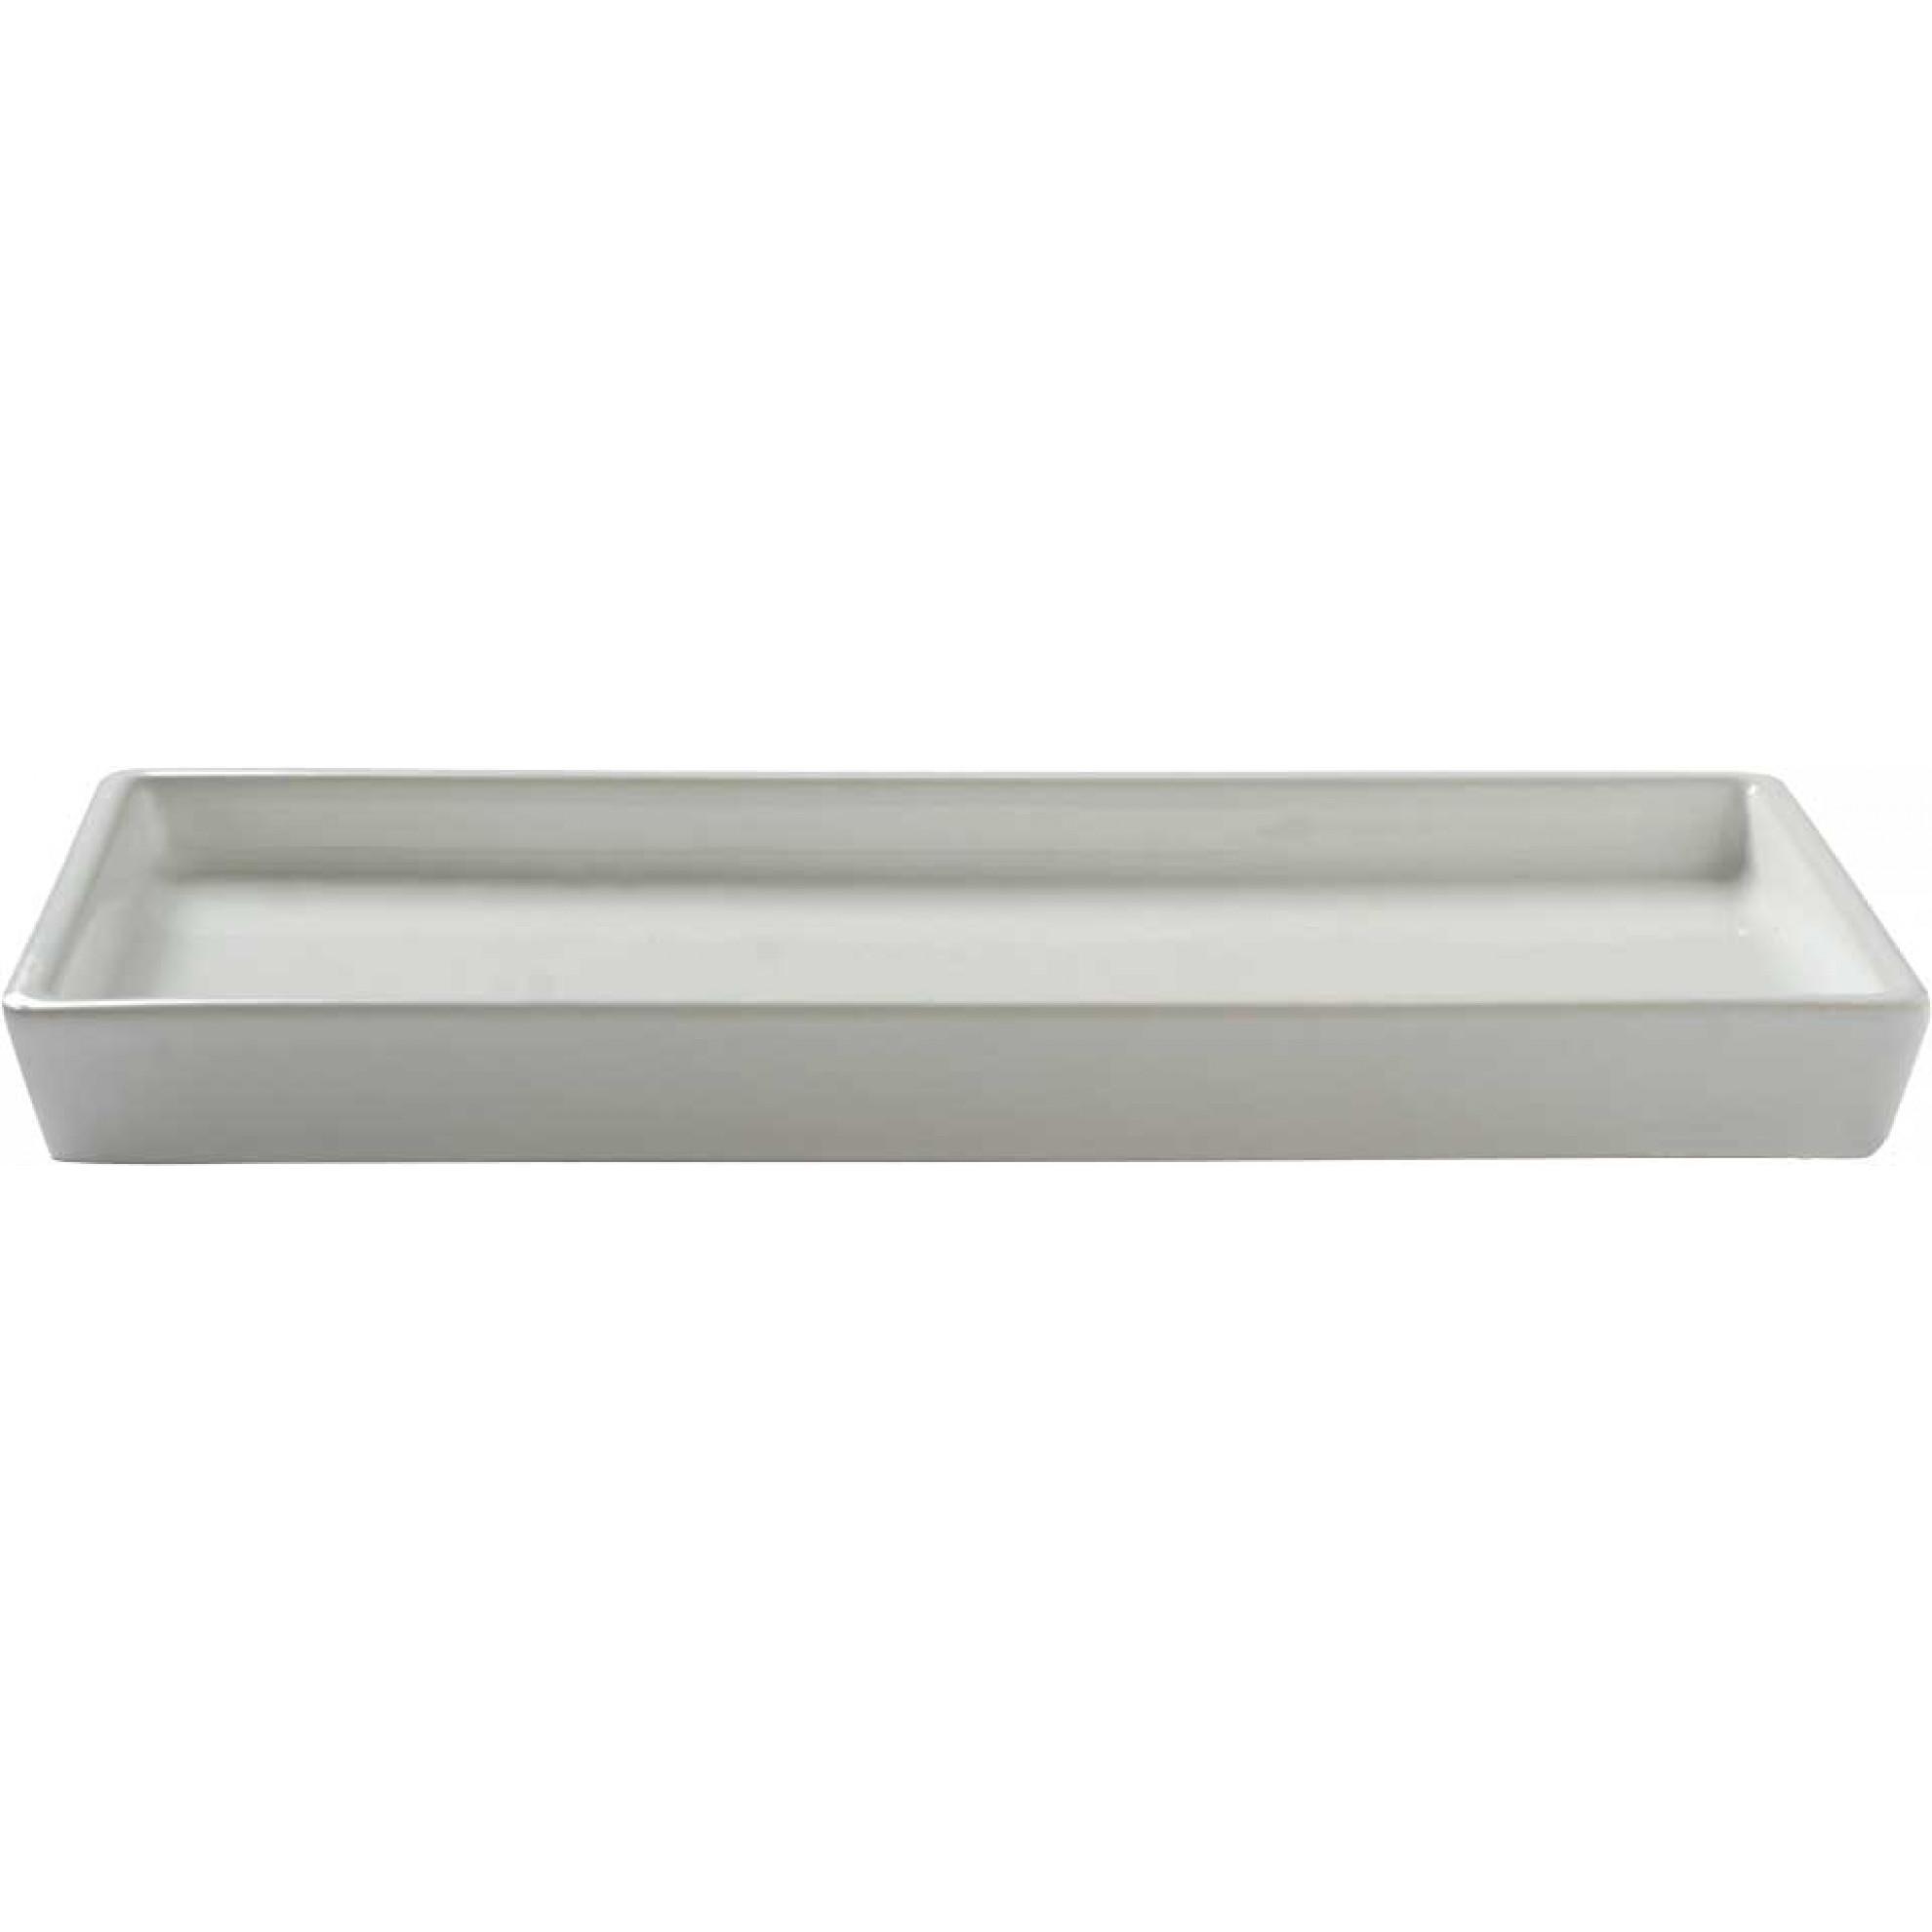 Spare Ceramic Drip Tray White For Triple Rack